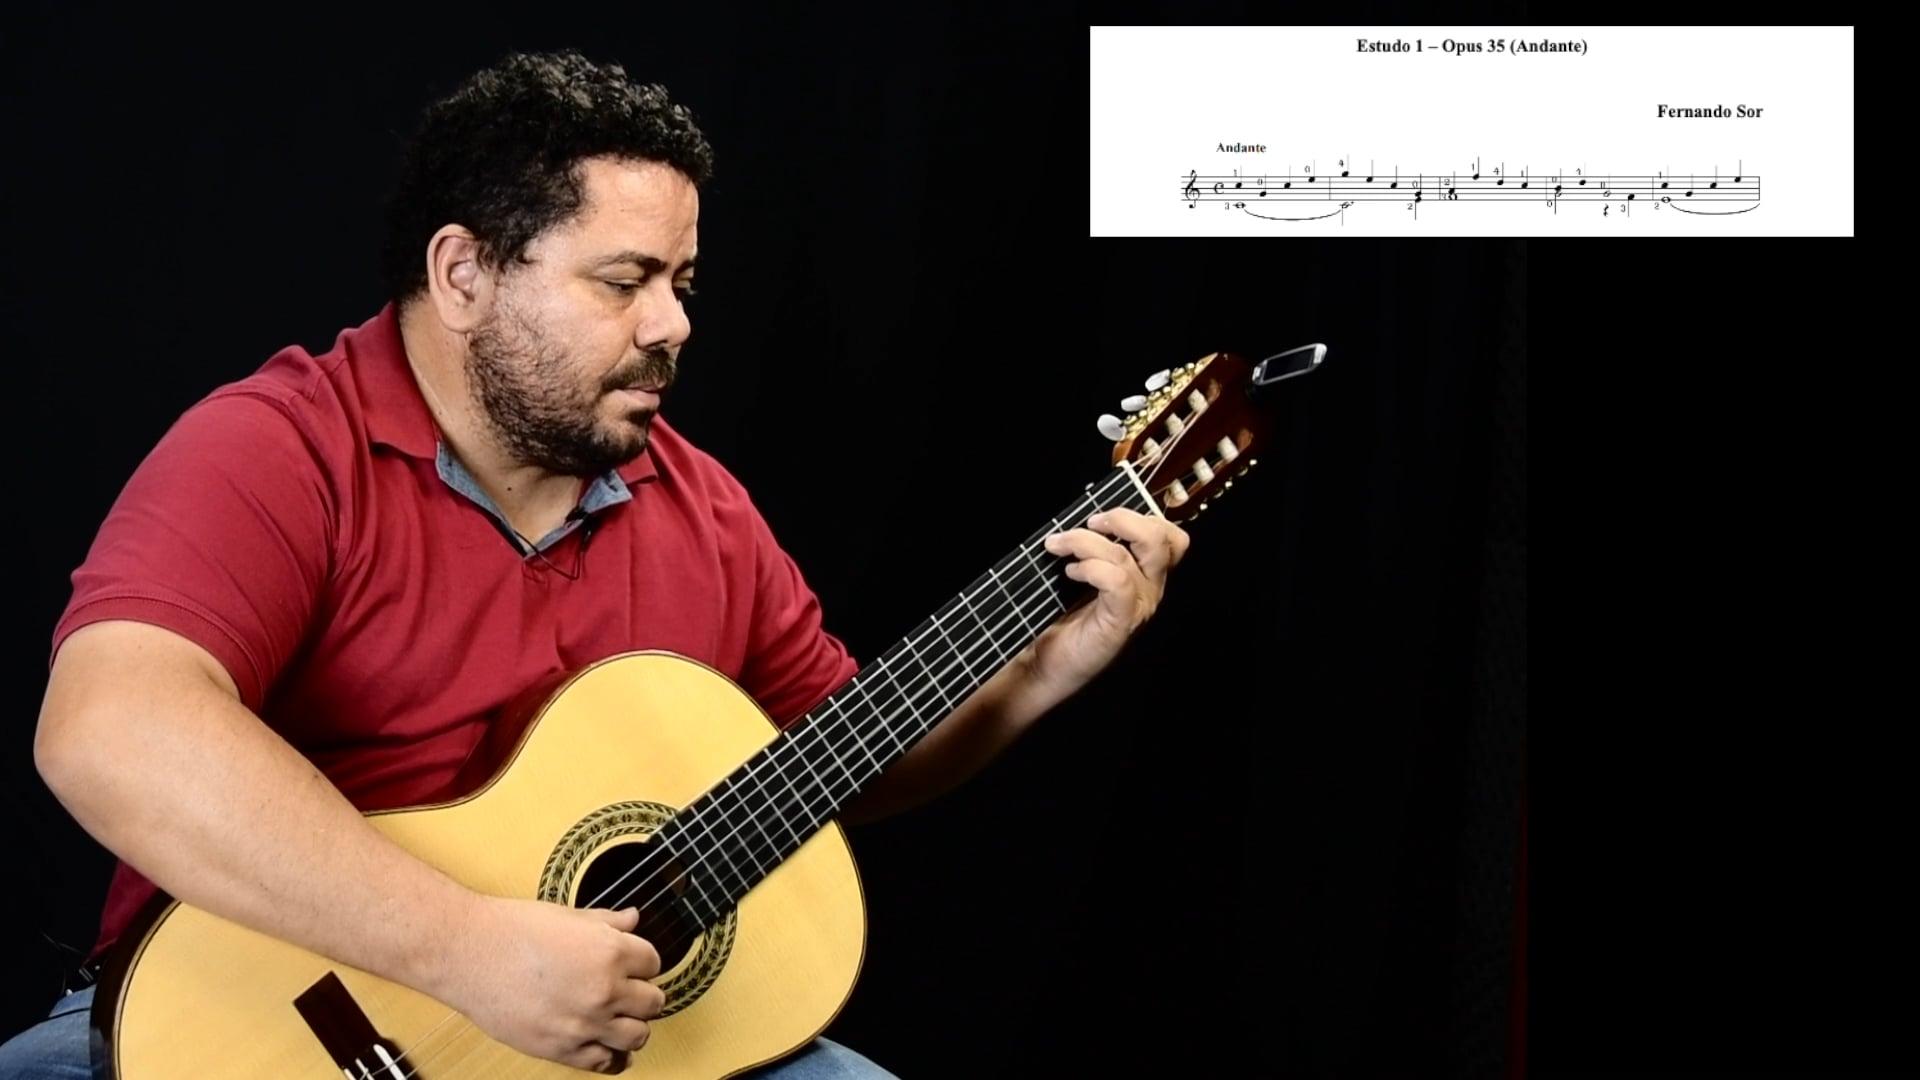 Andante Opus 33